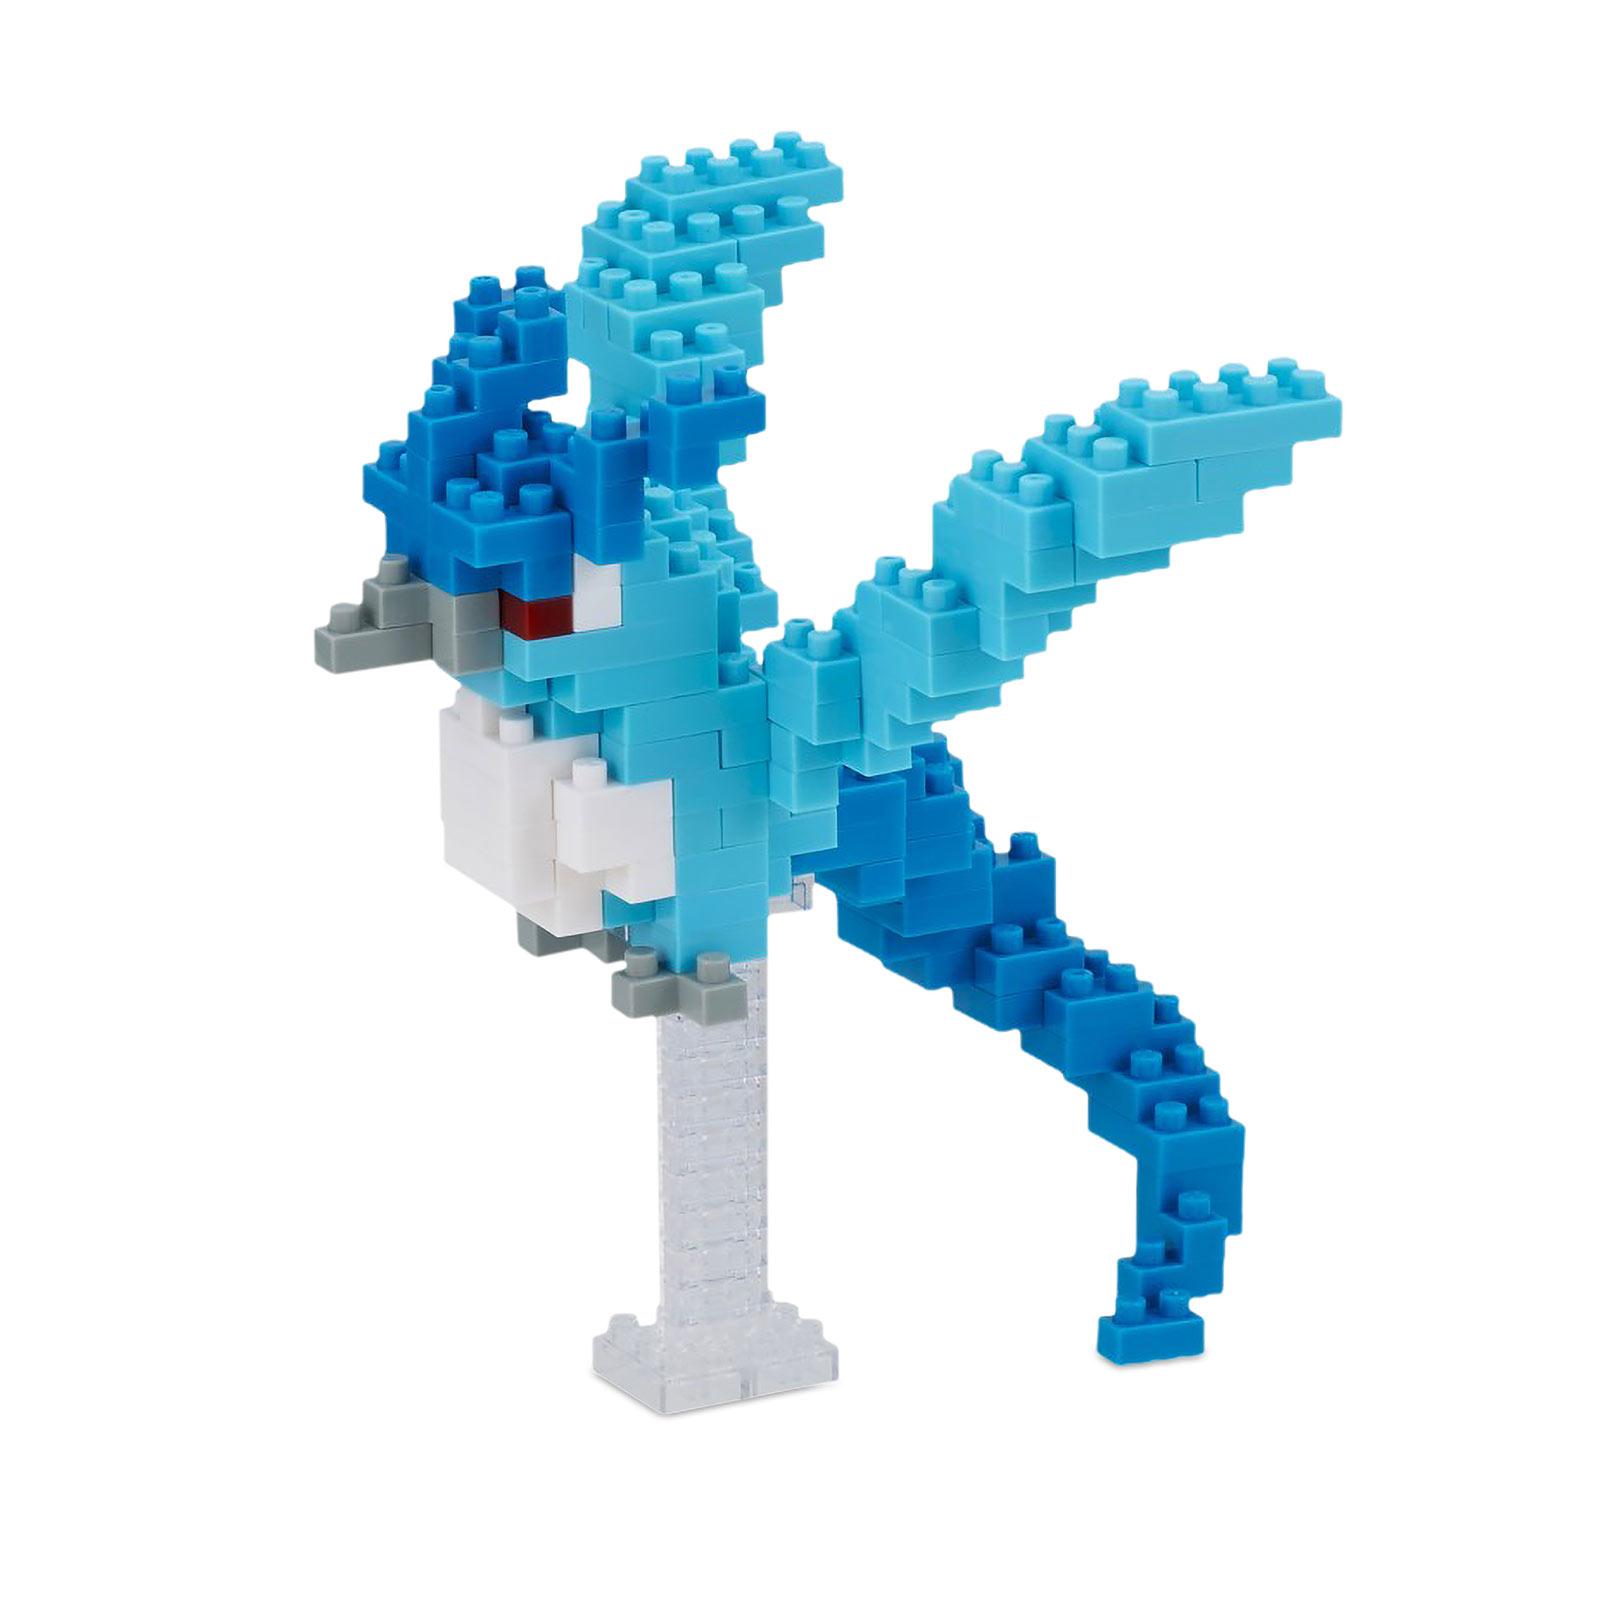 Pokemon - Arktos nanoblock Mini Baustein Figur